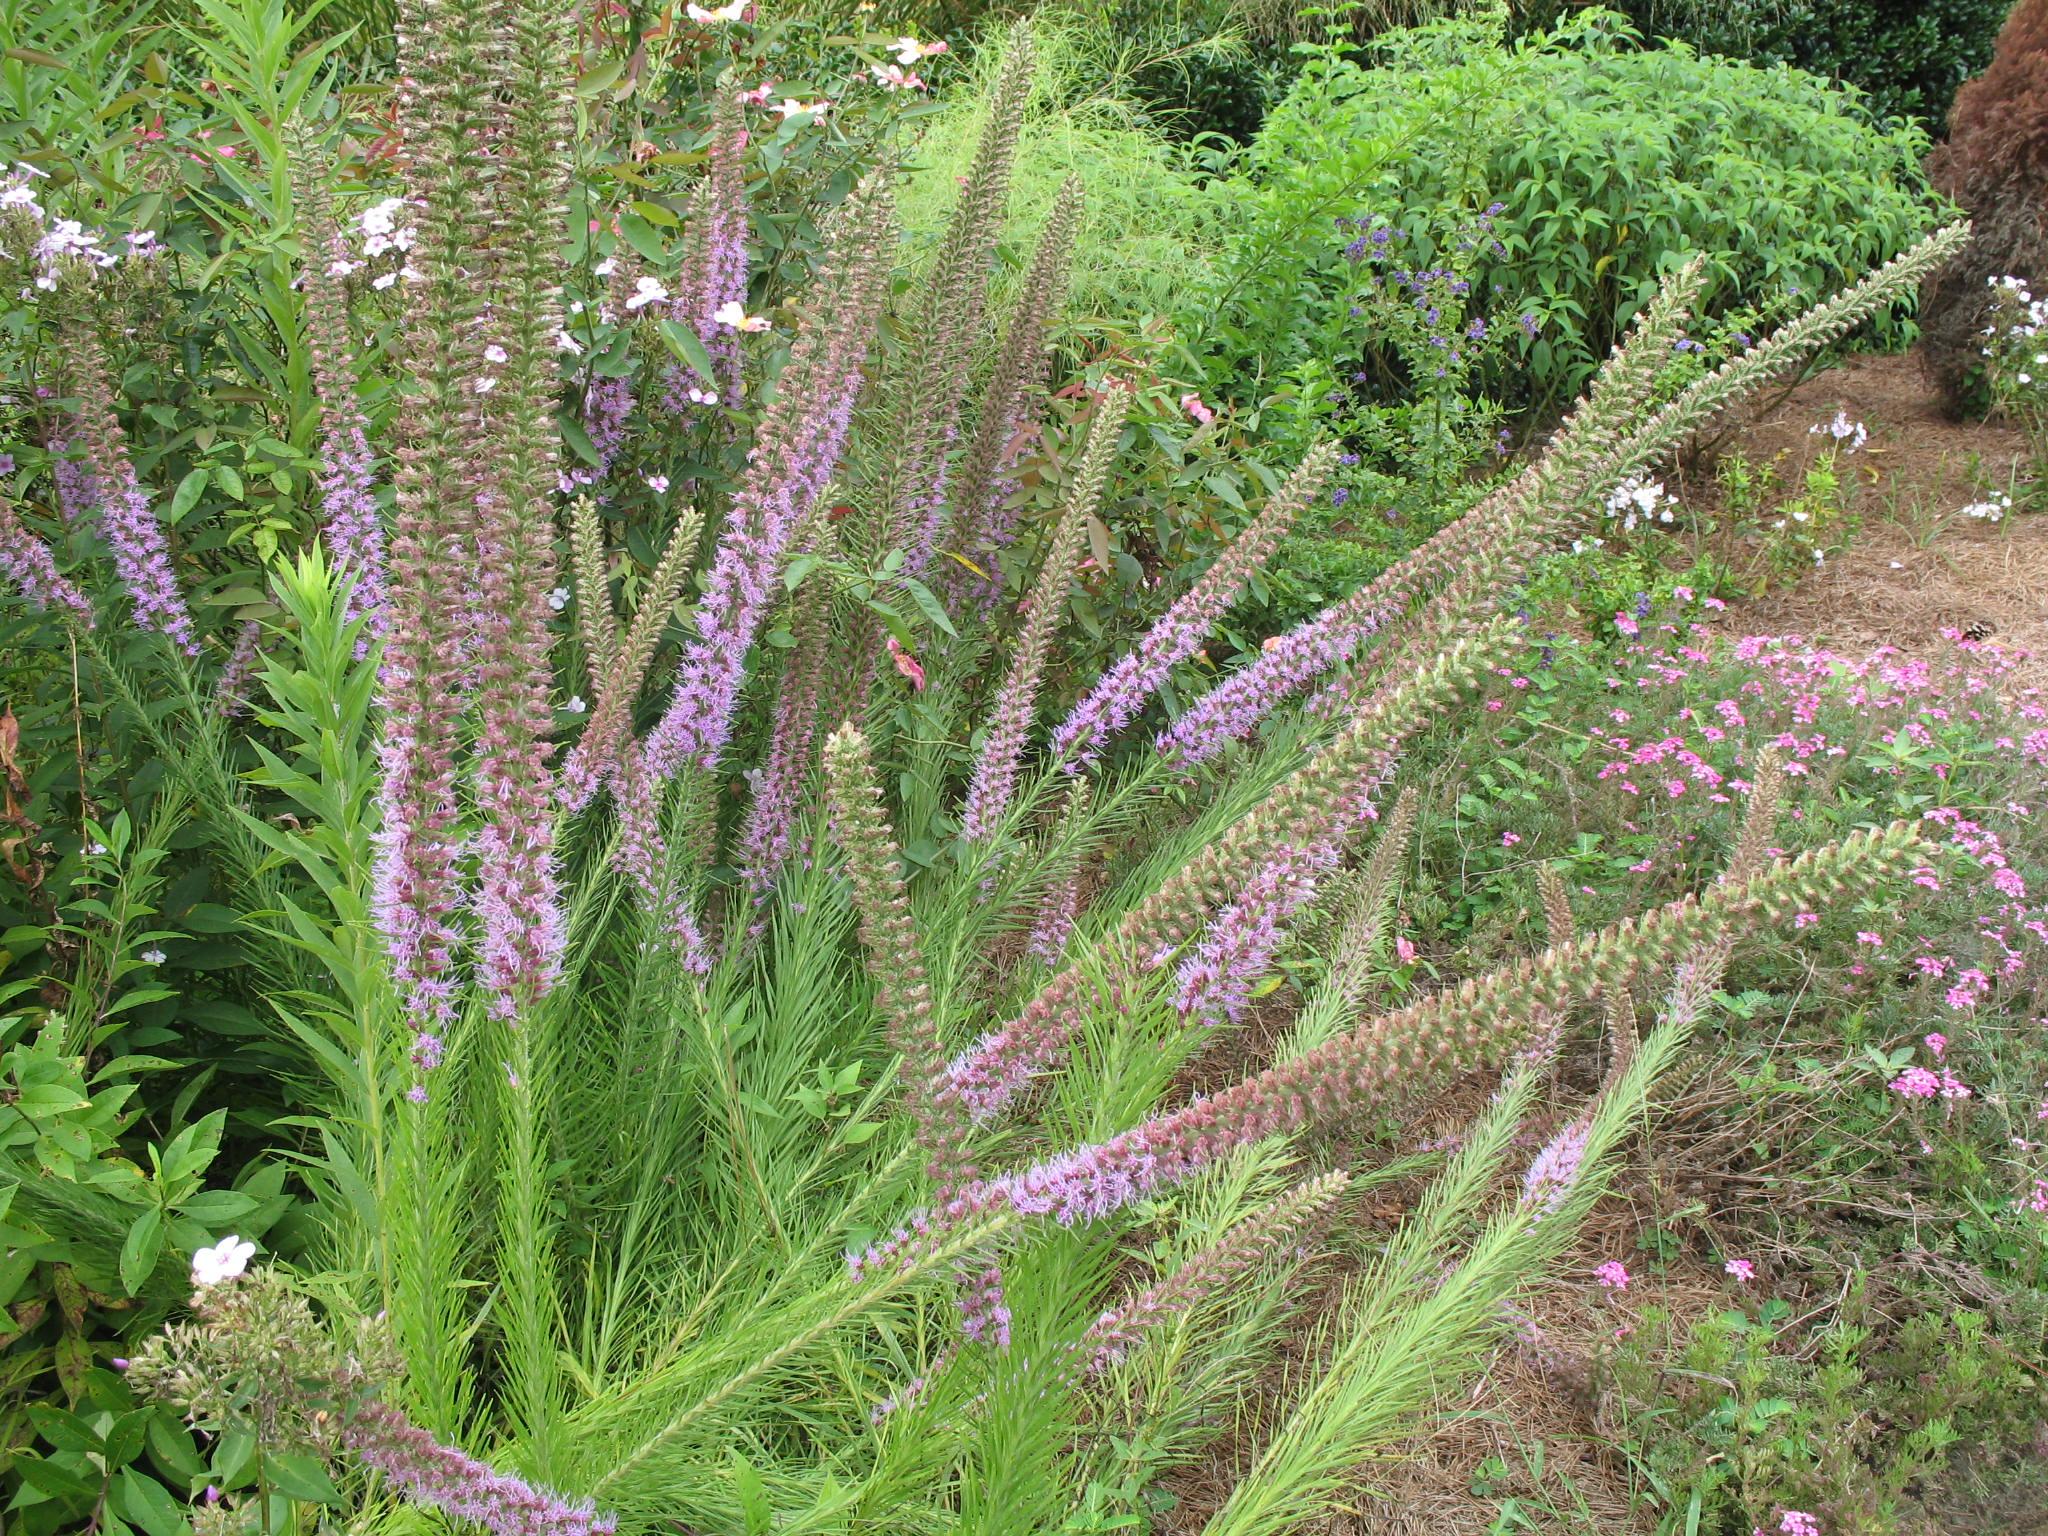 Liatris spicata / Liatris spicata